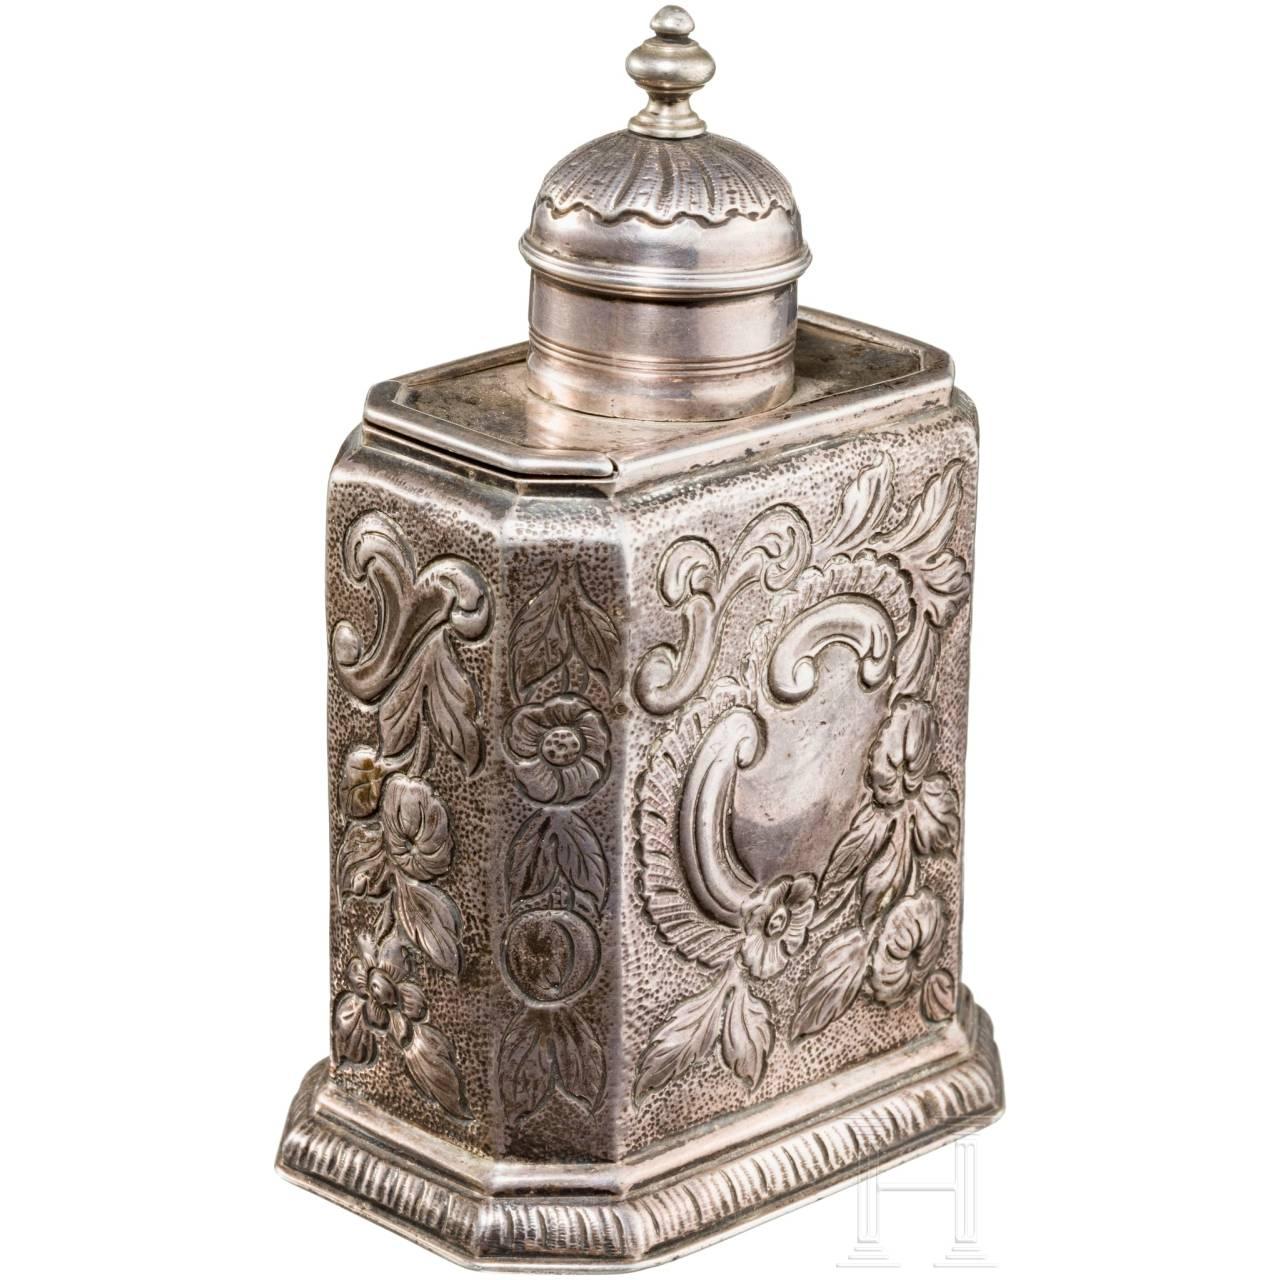 A silver tea caddy, London, 18th century